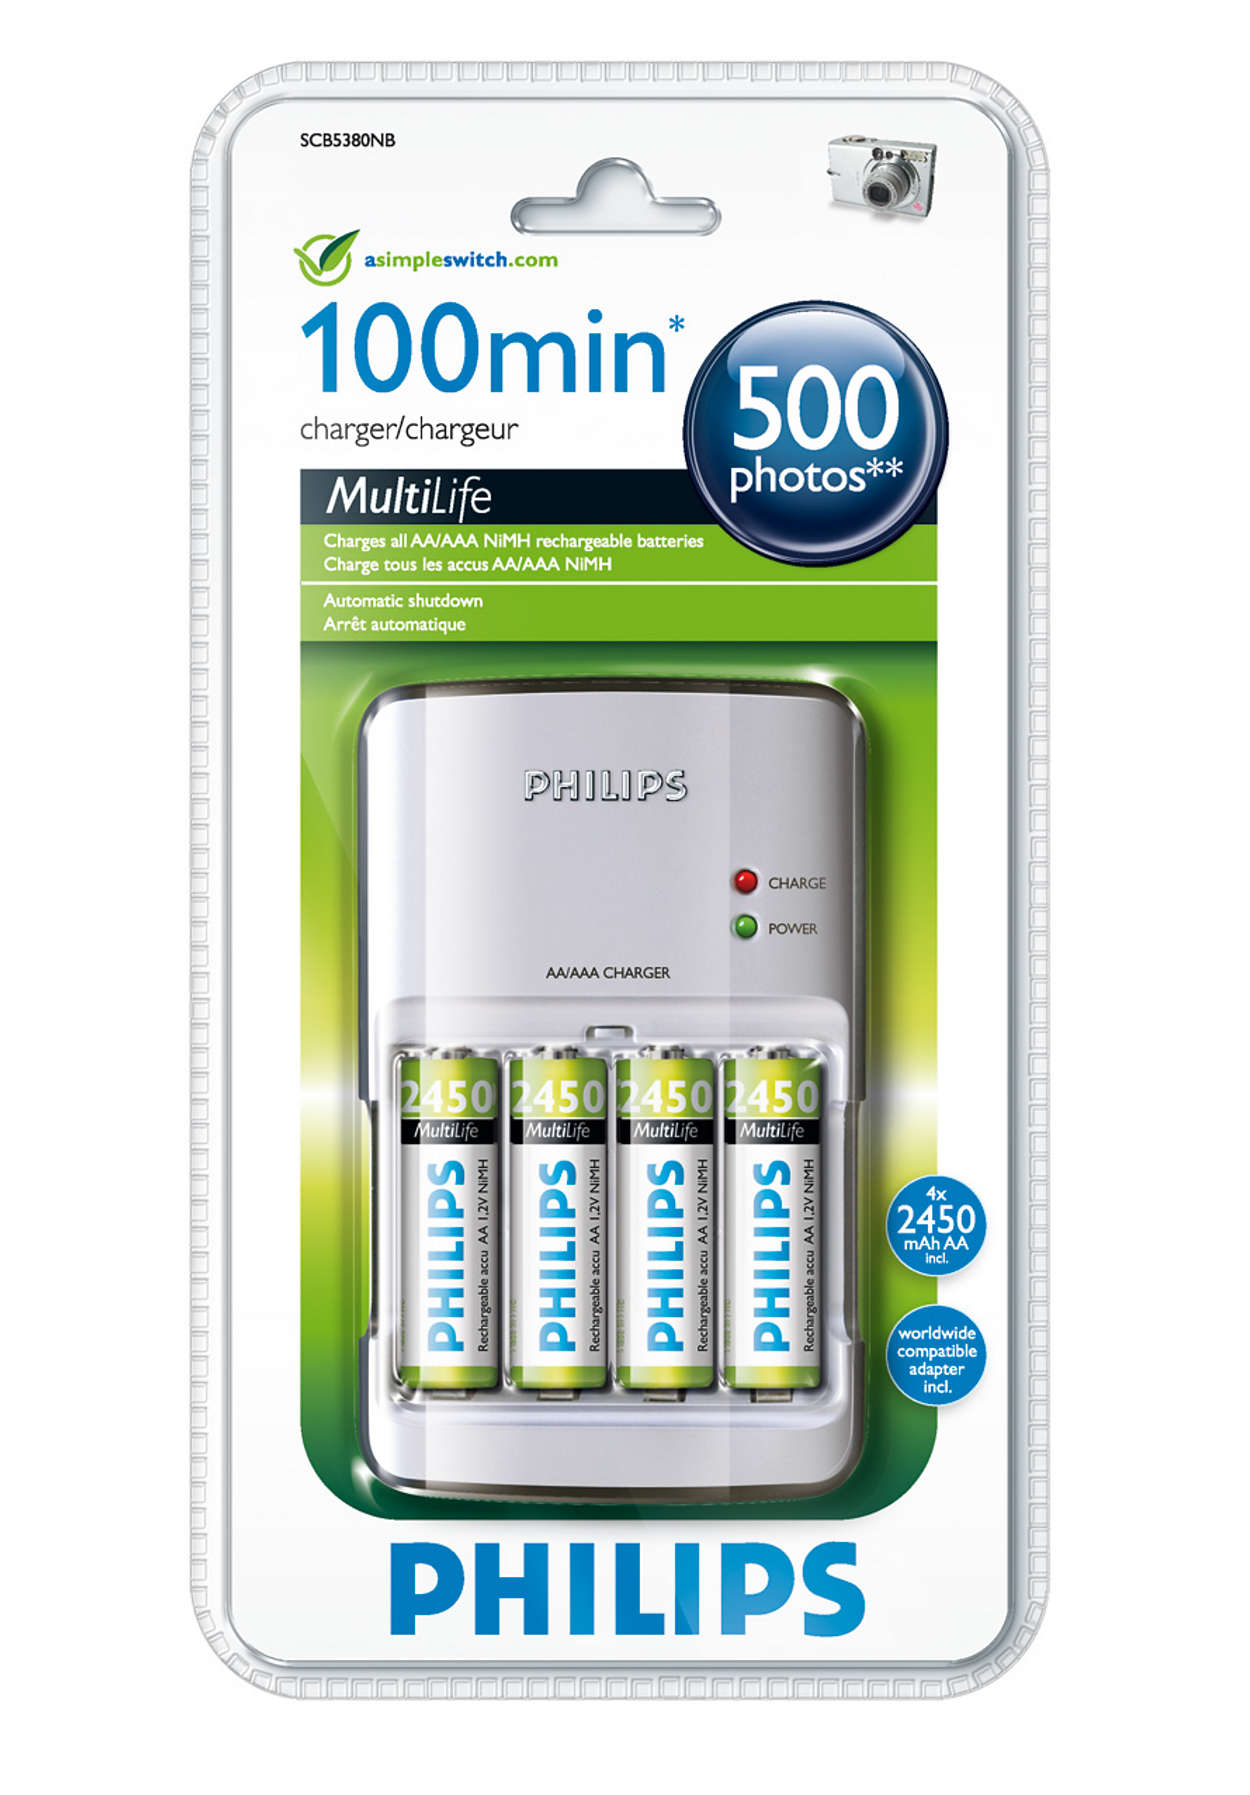 Полная зарядка аккумуляторов за 100 минут